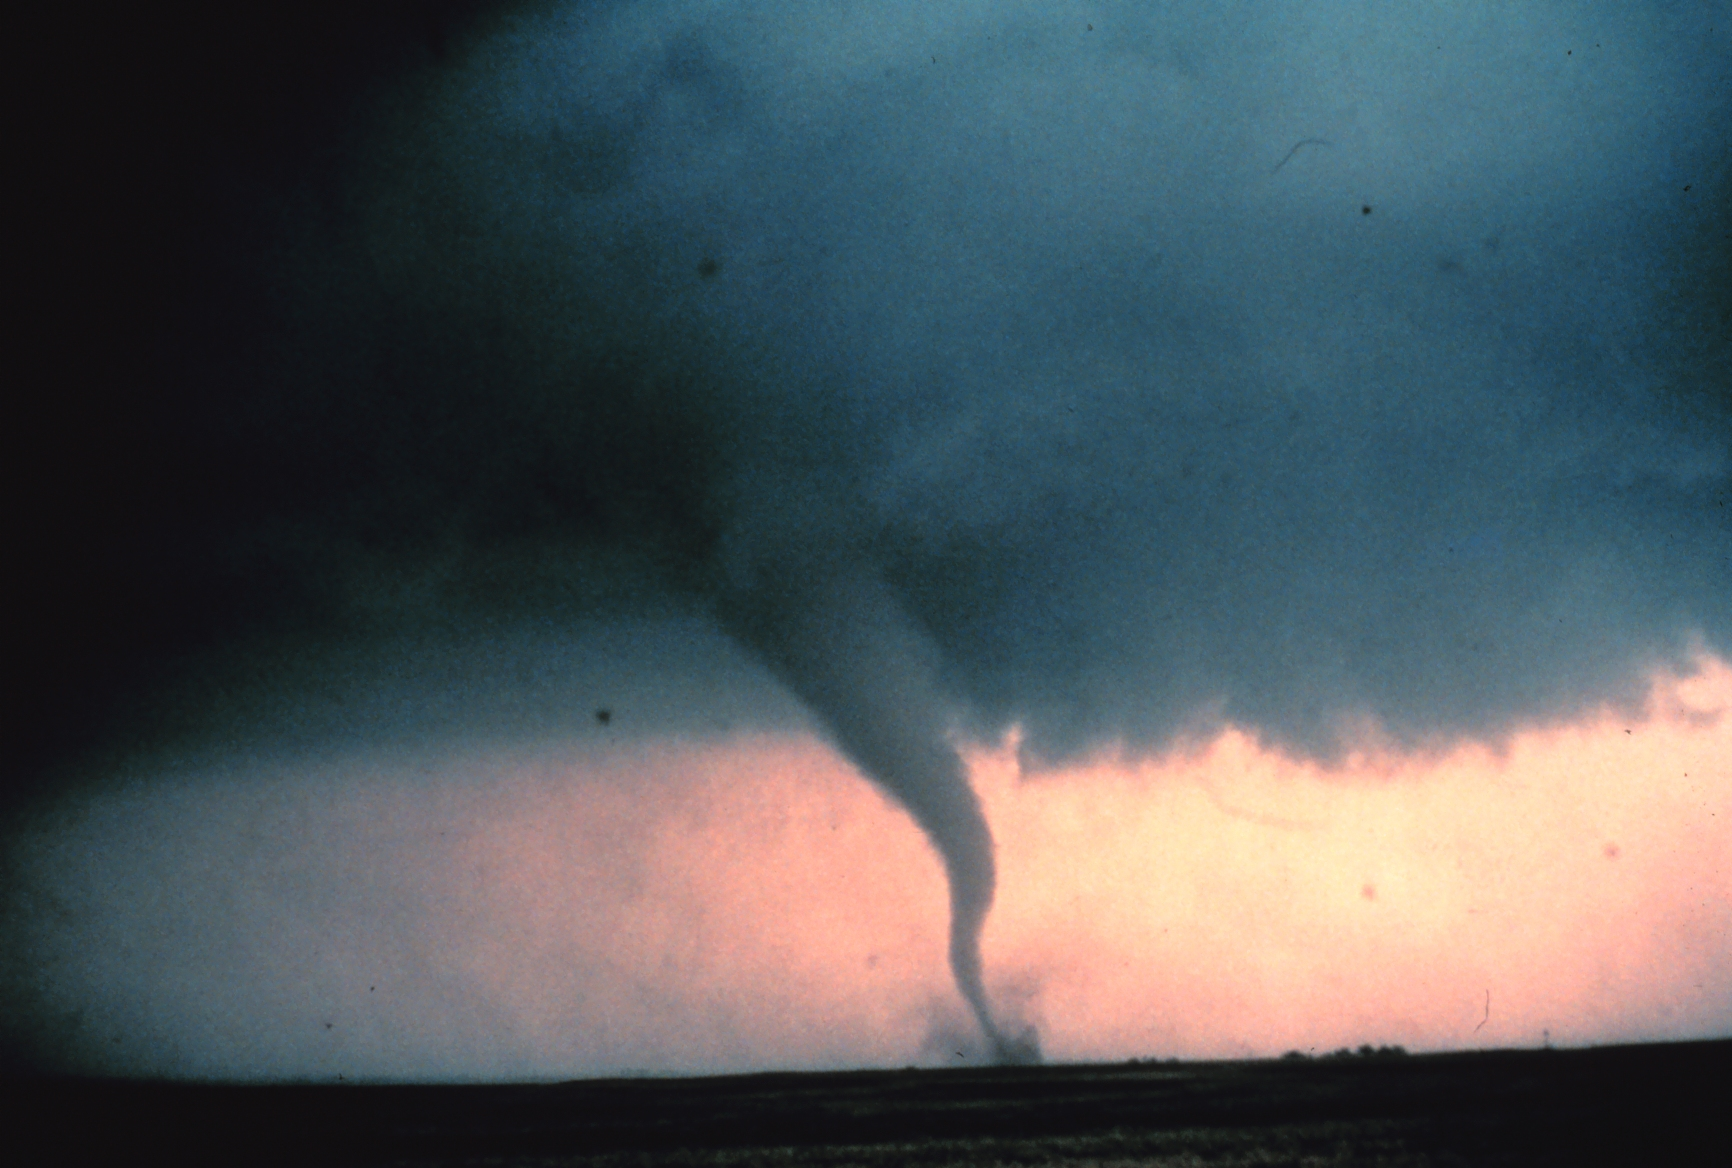 Tornado0_-_NOAA.jpg